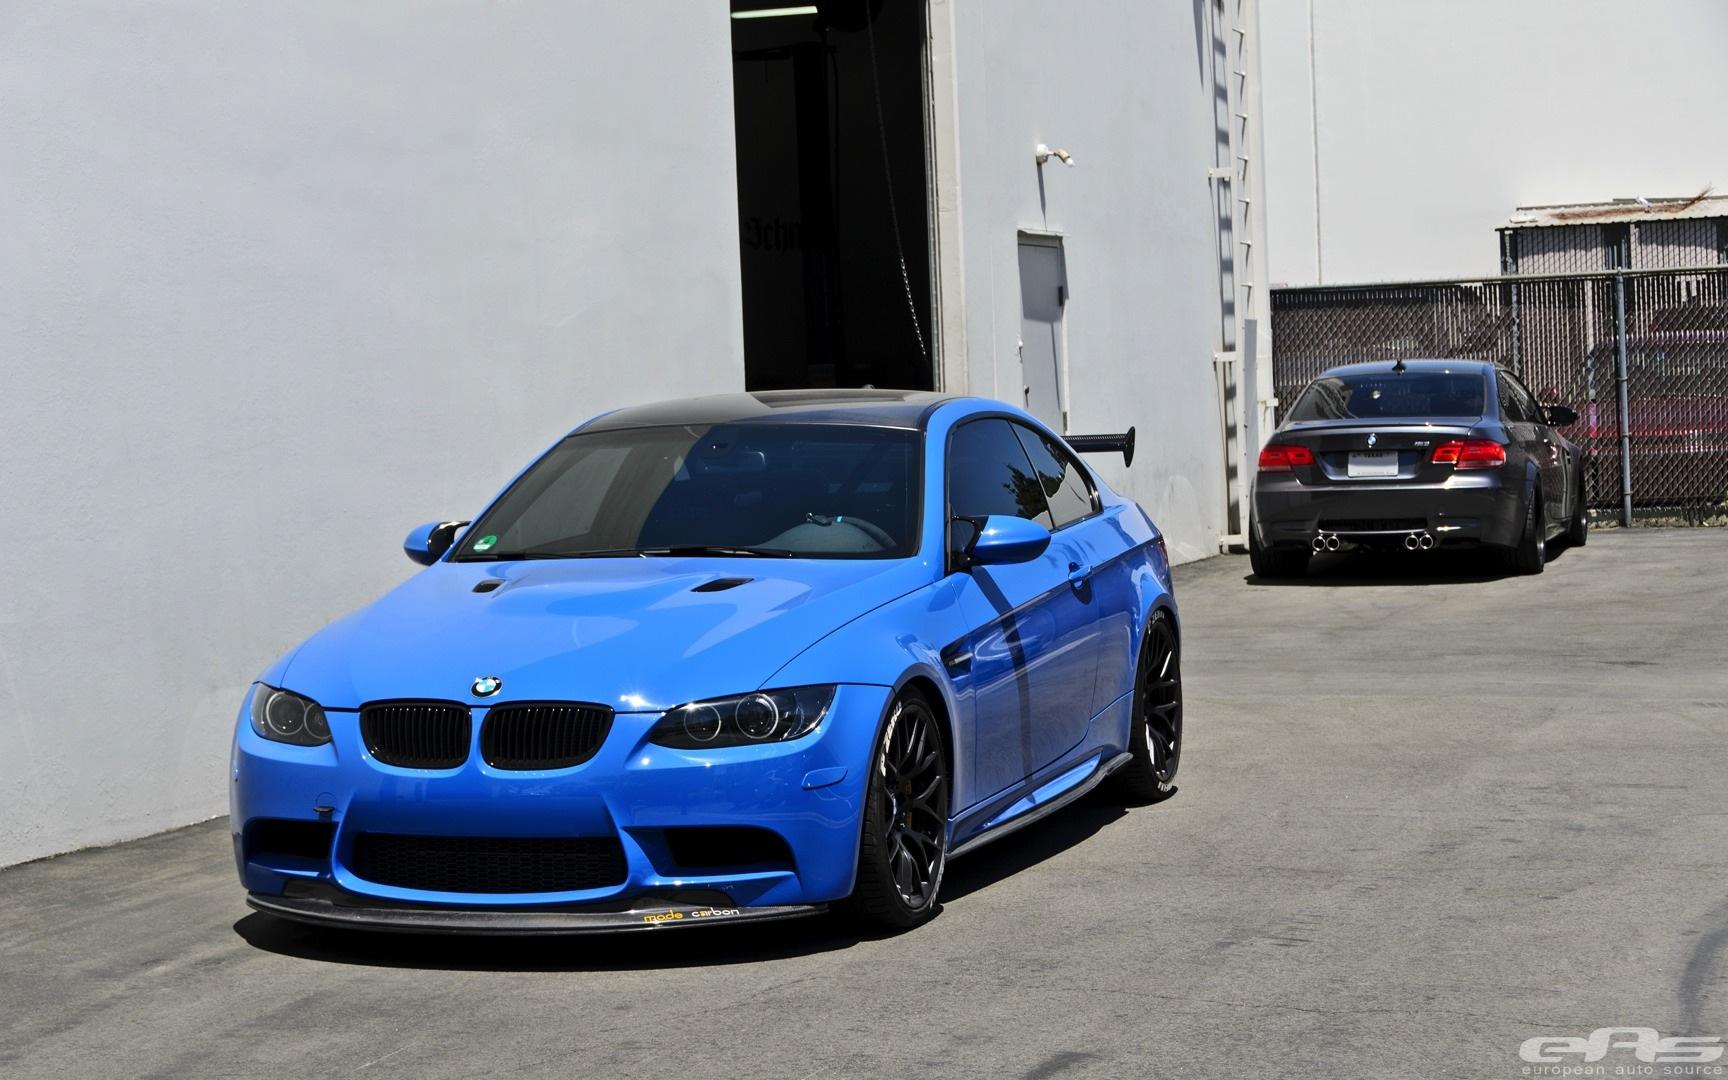 Bmw Concept Car Wallpaper Santorini Blue Bmw E92 M3 Gets Serious At Eas Autoevolution